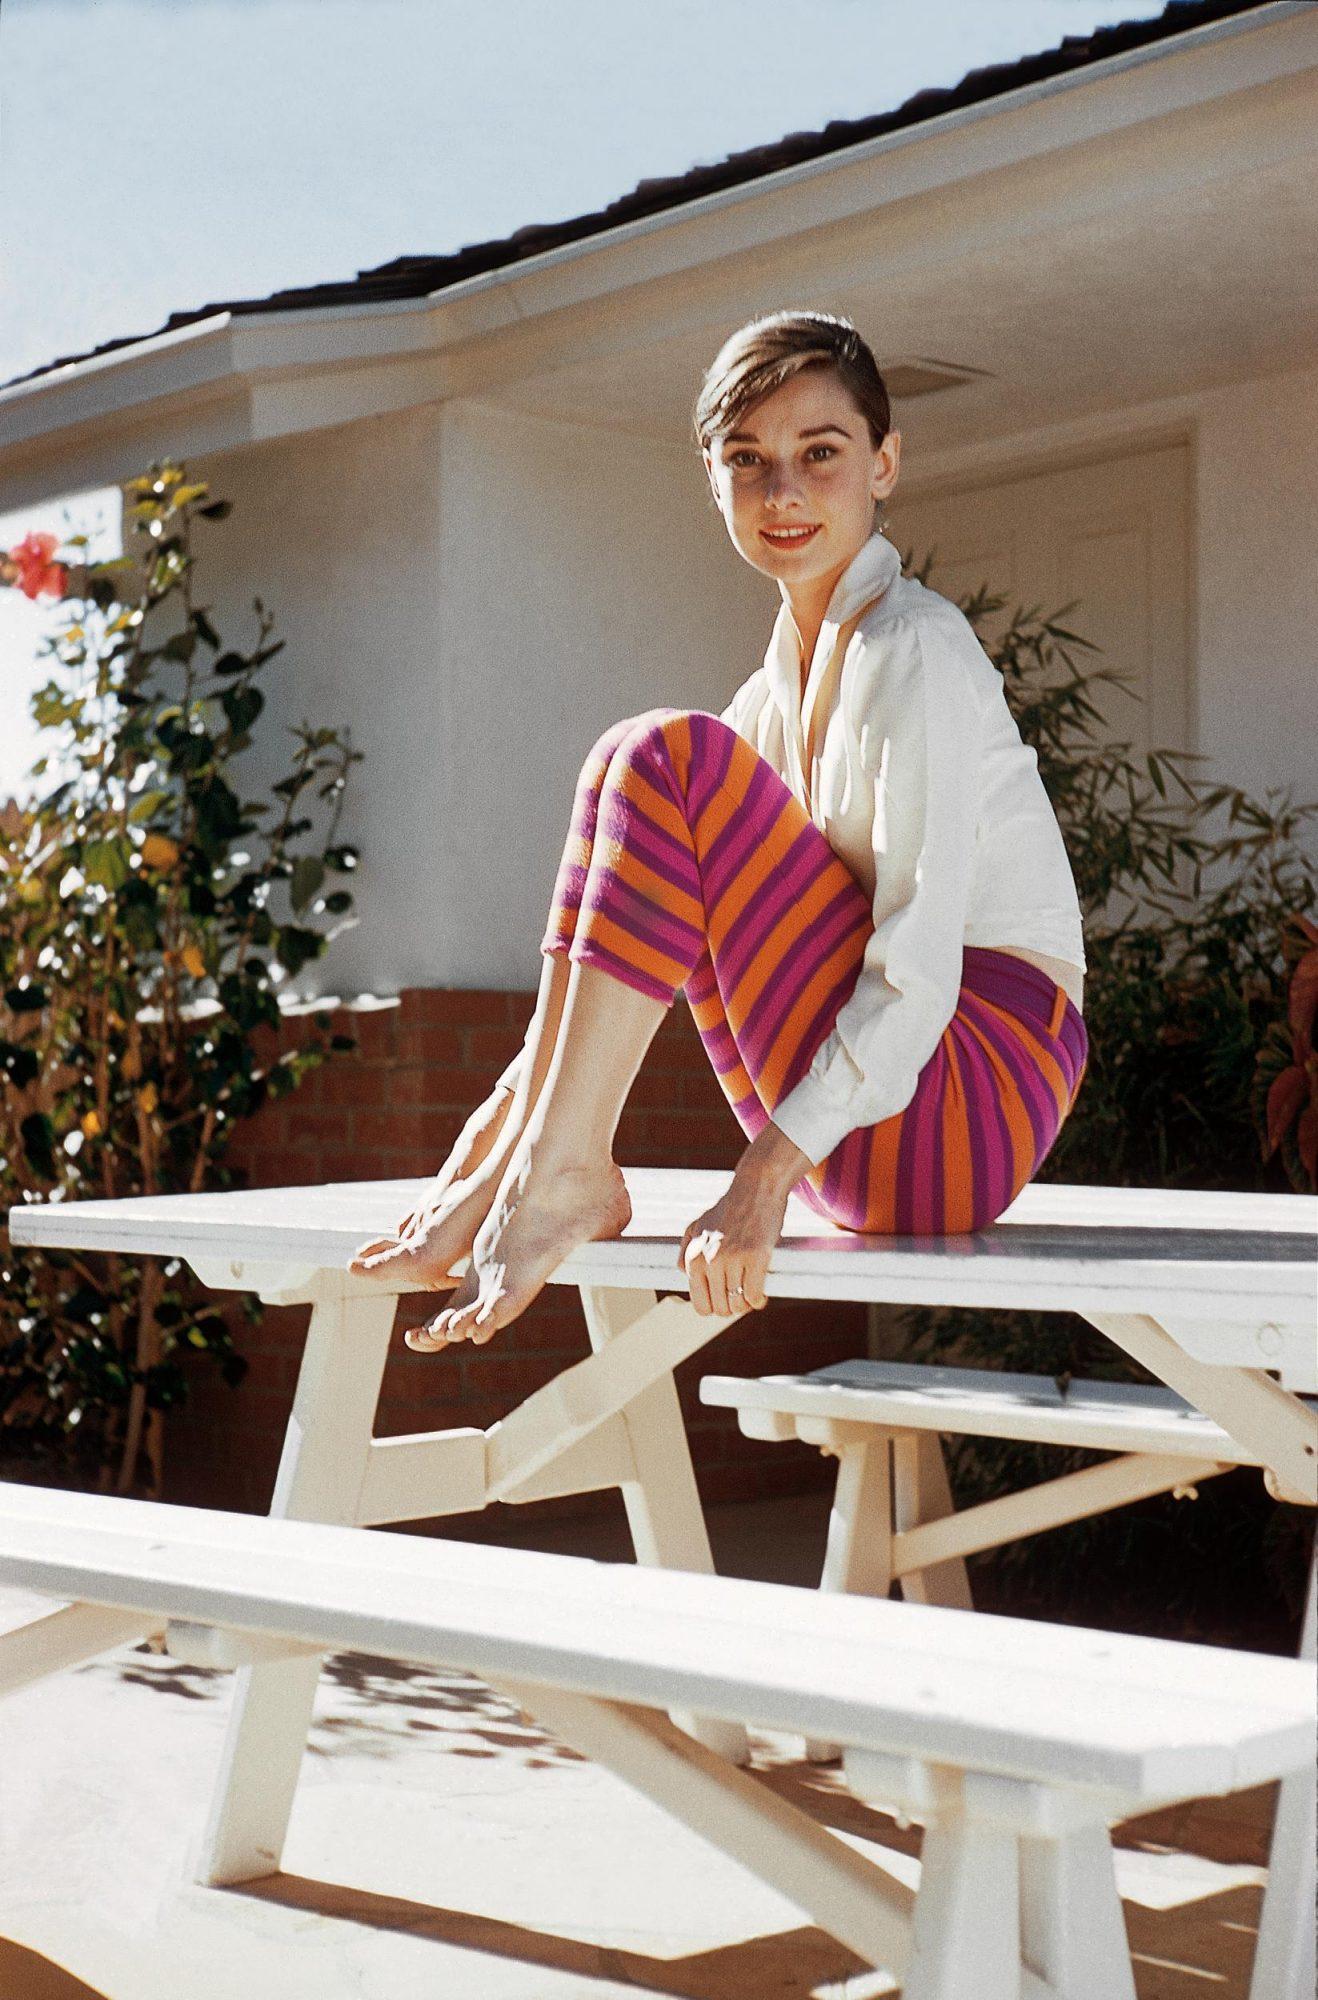 Audrey Hepburn: Πώς θα αντιγράψεις σήμερα το καλοκαιρινό στυλ της;